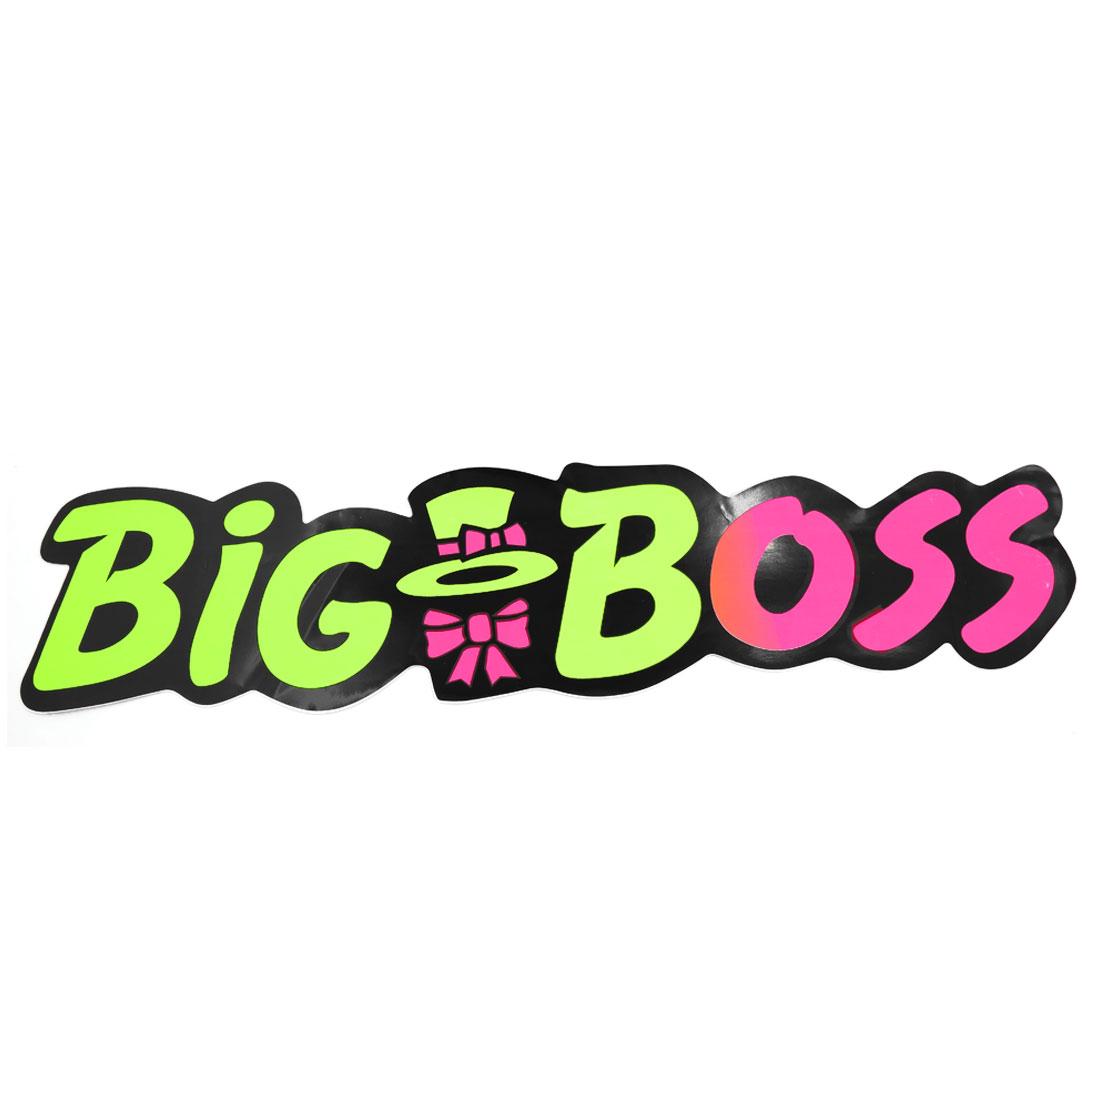 BIG BOSS Printed Plastic Sticker Decor Self Adhesive Exterior Adorn Decal 53cm x 12cm